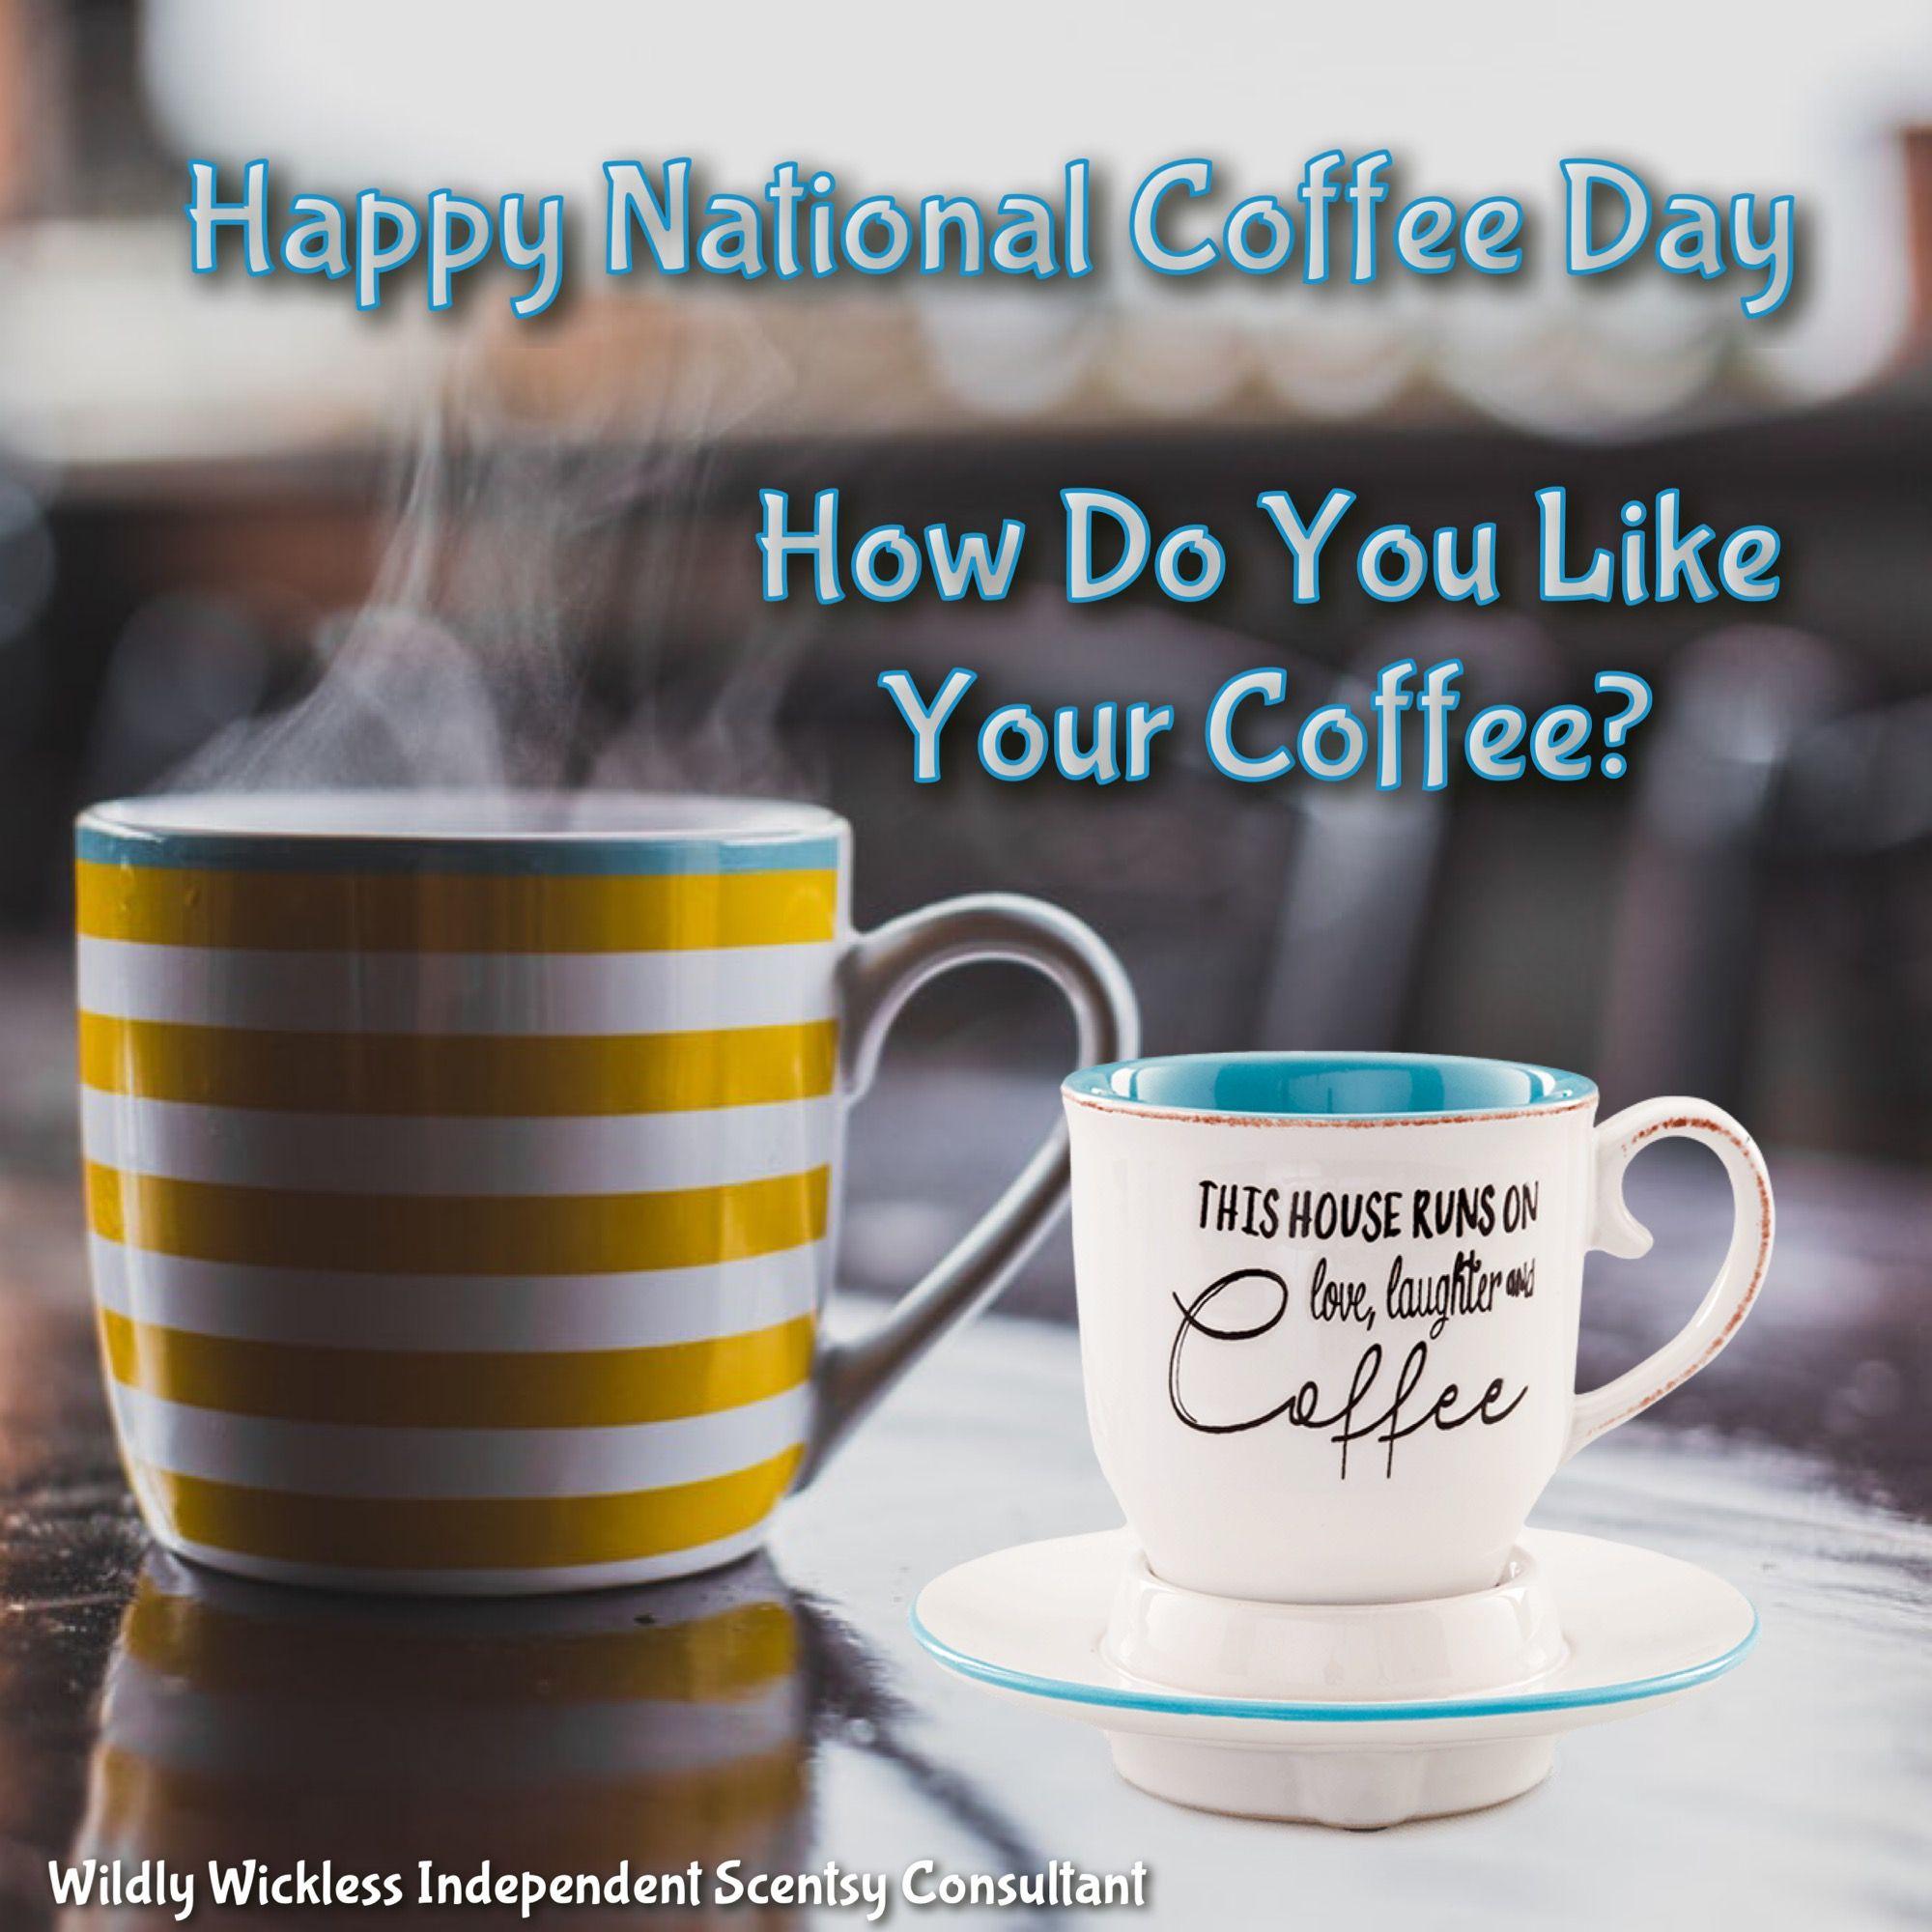 Happy National Coffee Day! holdthecreamandsugar